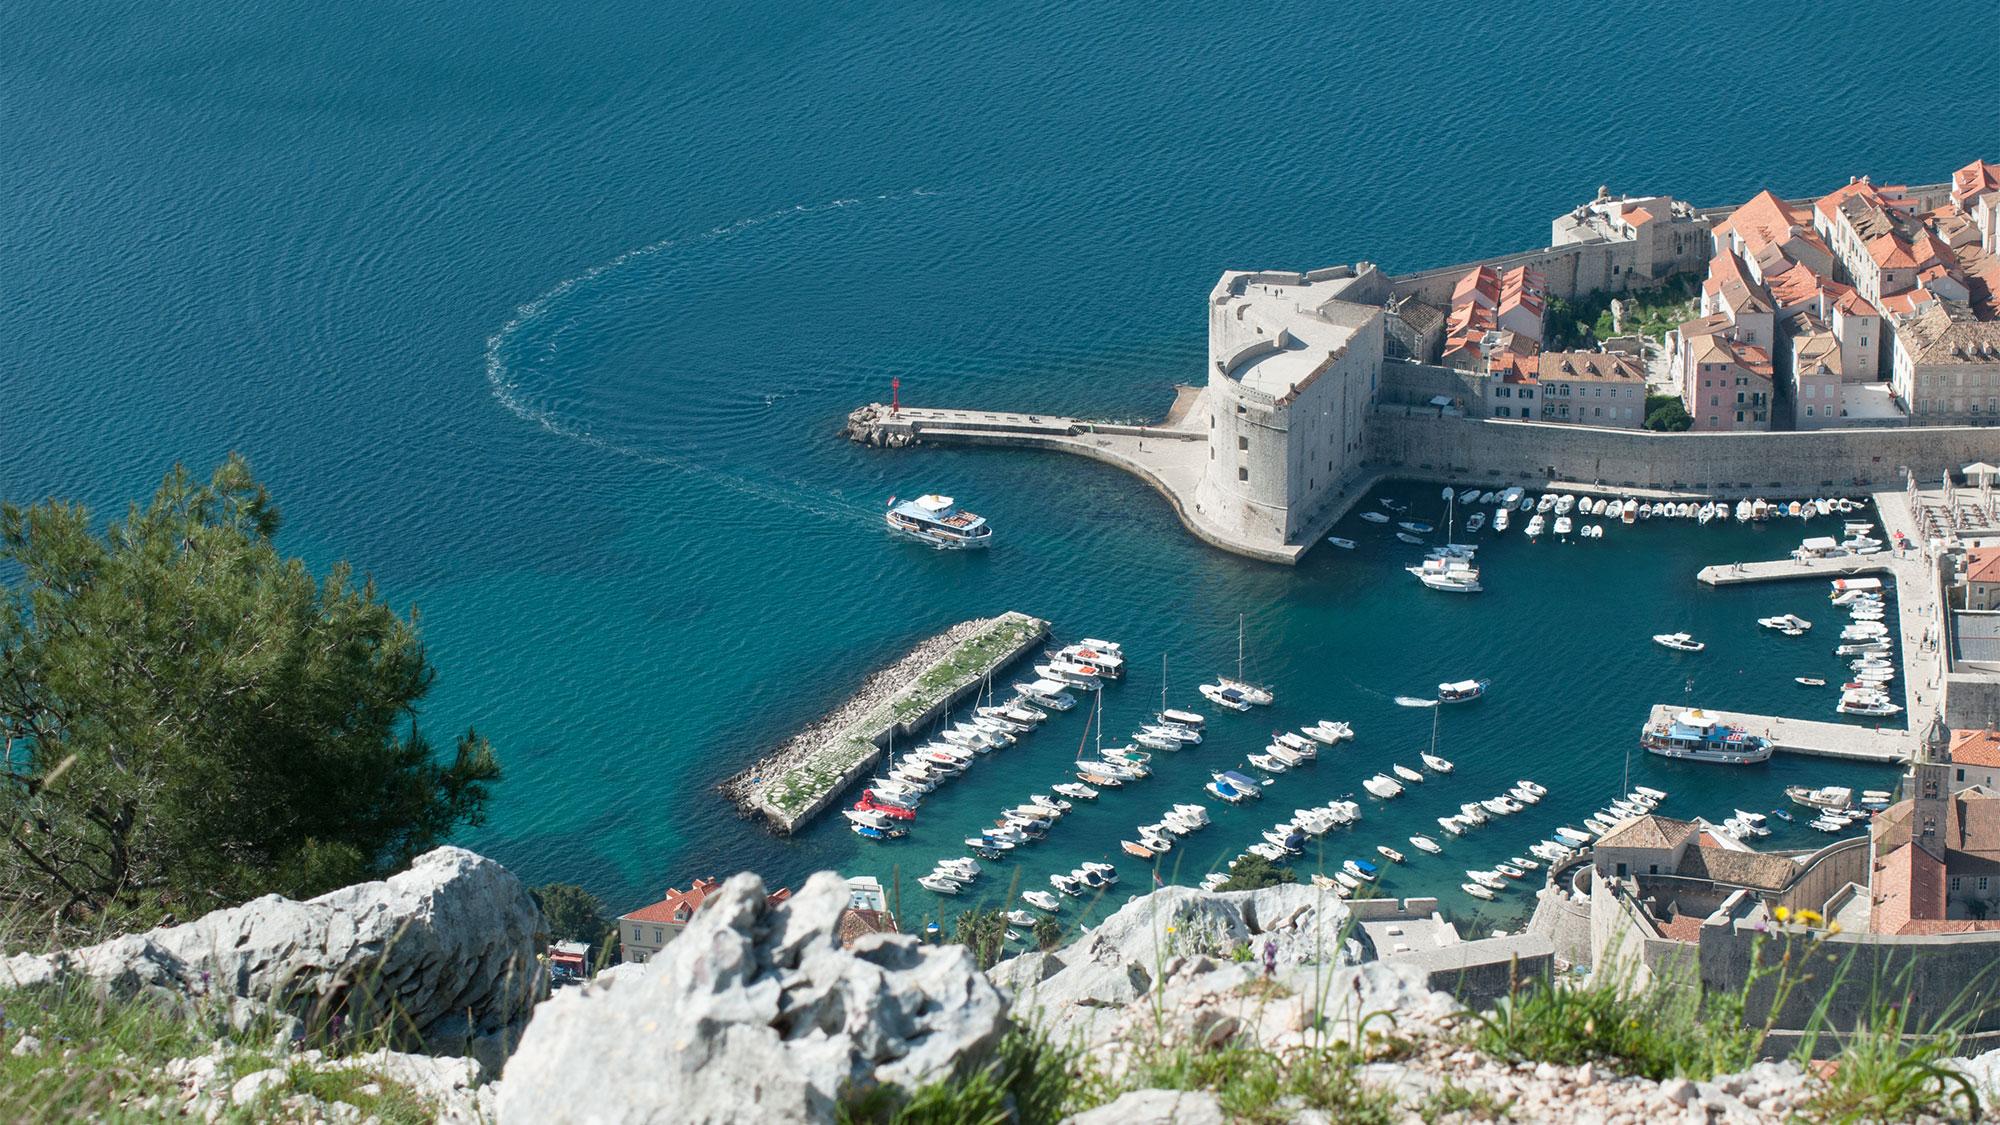 Dubrovnik [Credit: Jane Barrett/Shutterstock.com]